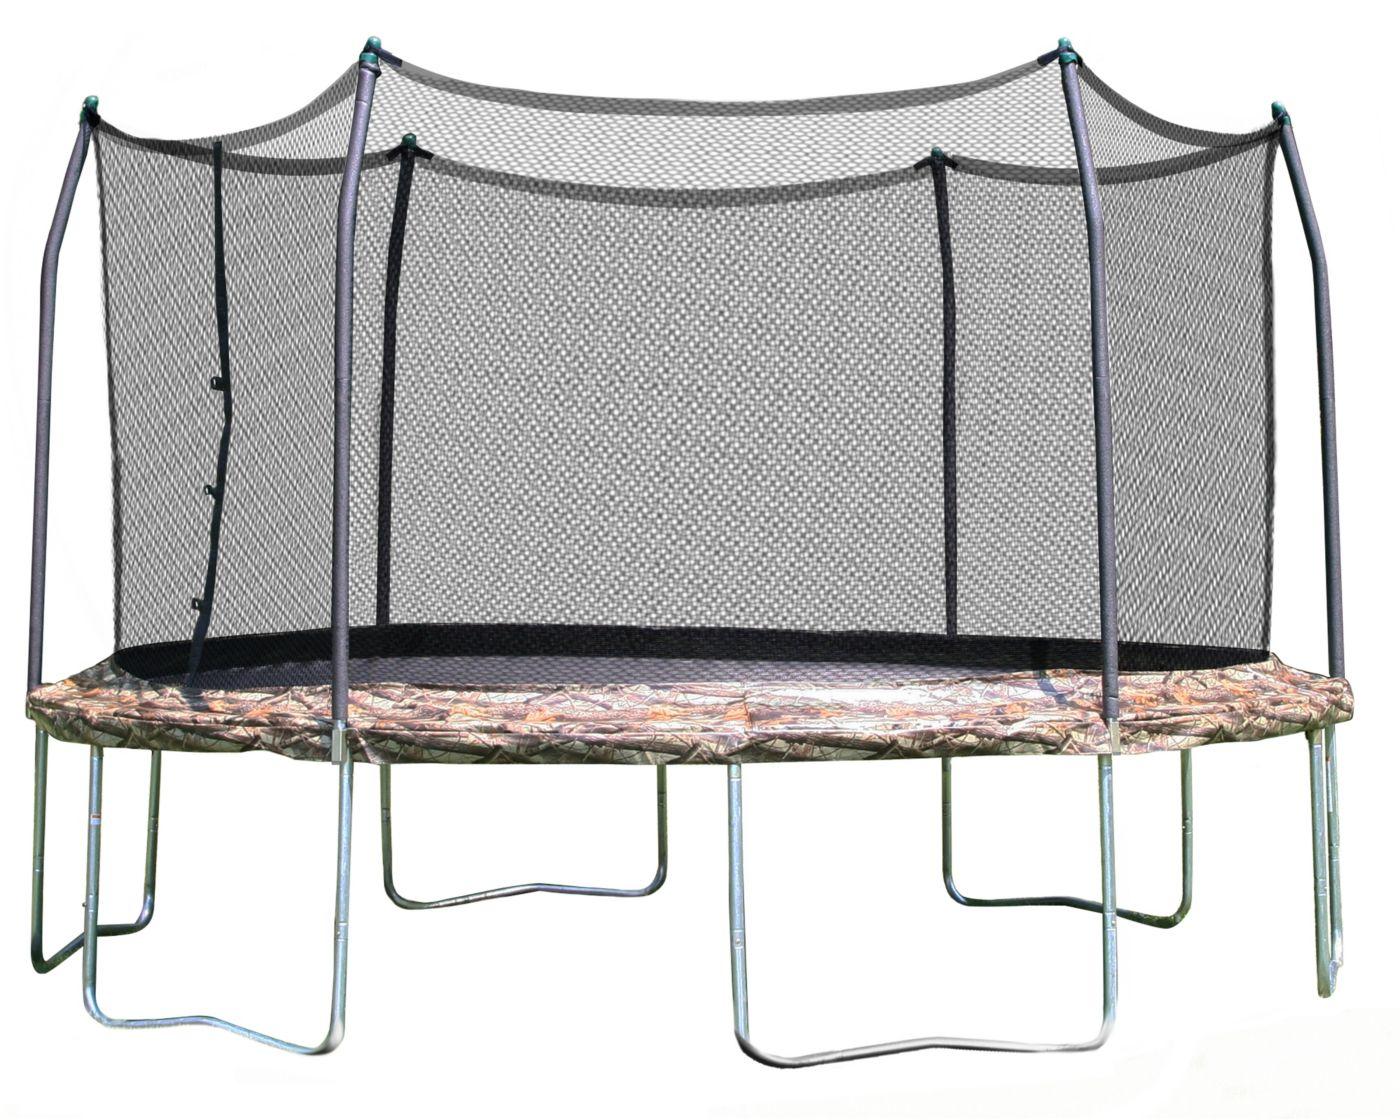 Skywalker Trampolines 15' Round Camo Trampoline with Enclosure